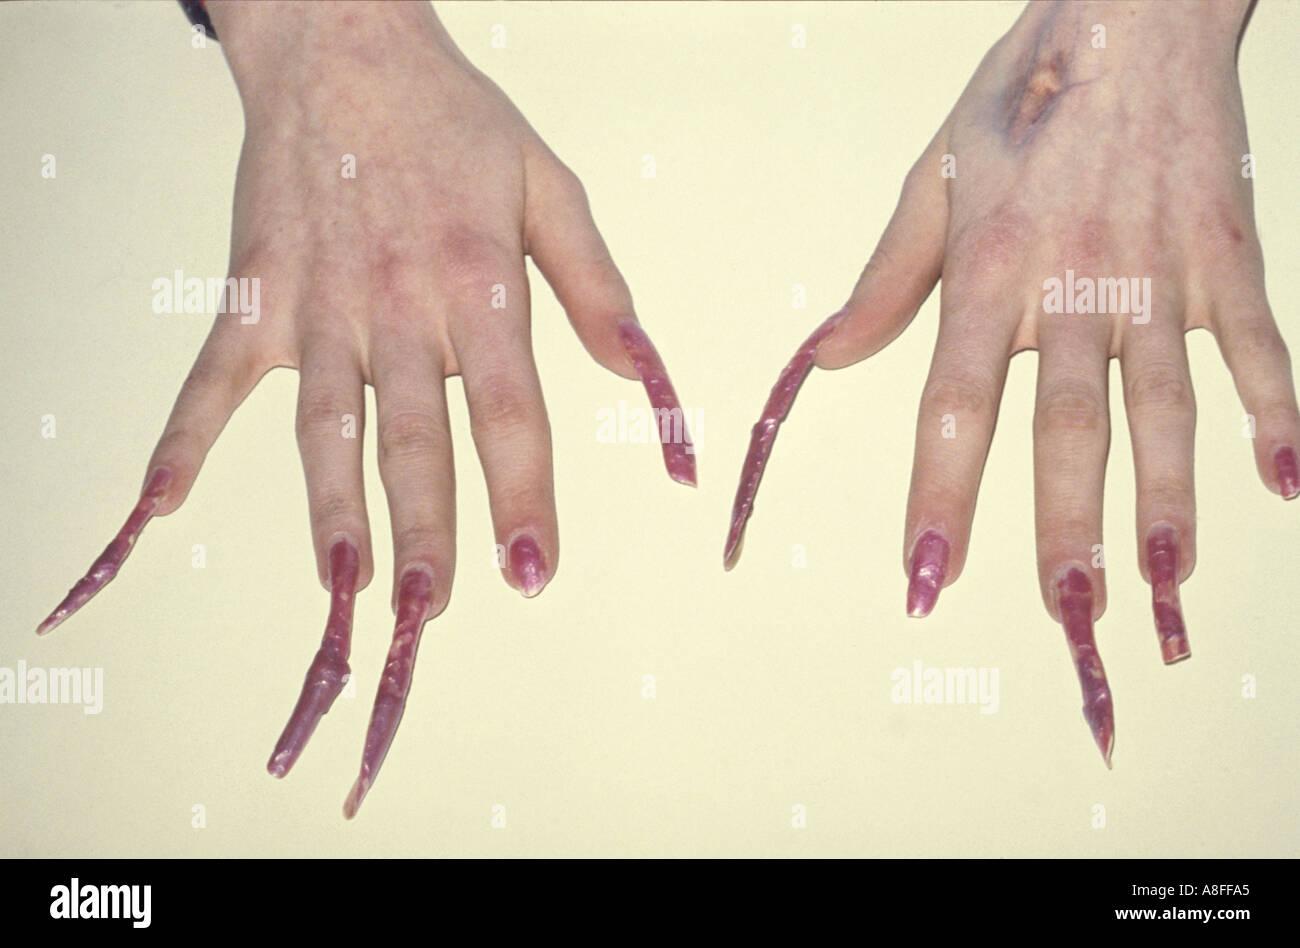 Long nails Stock Photo: 589733 - Alamy